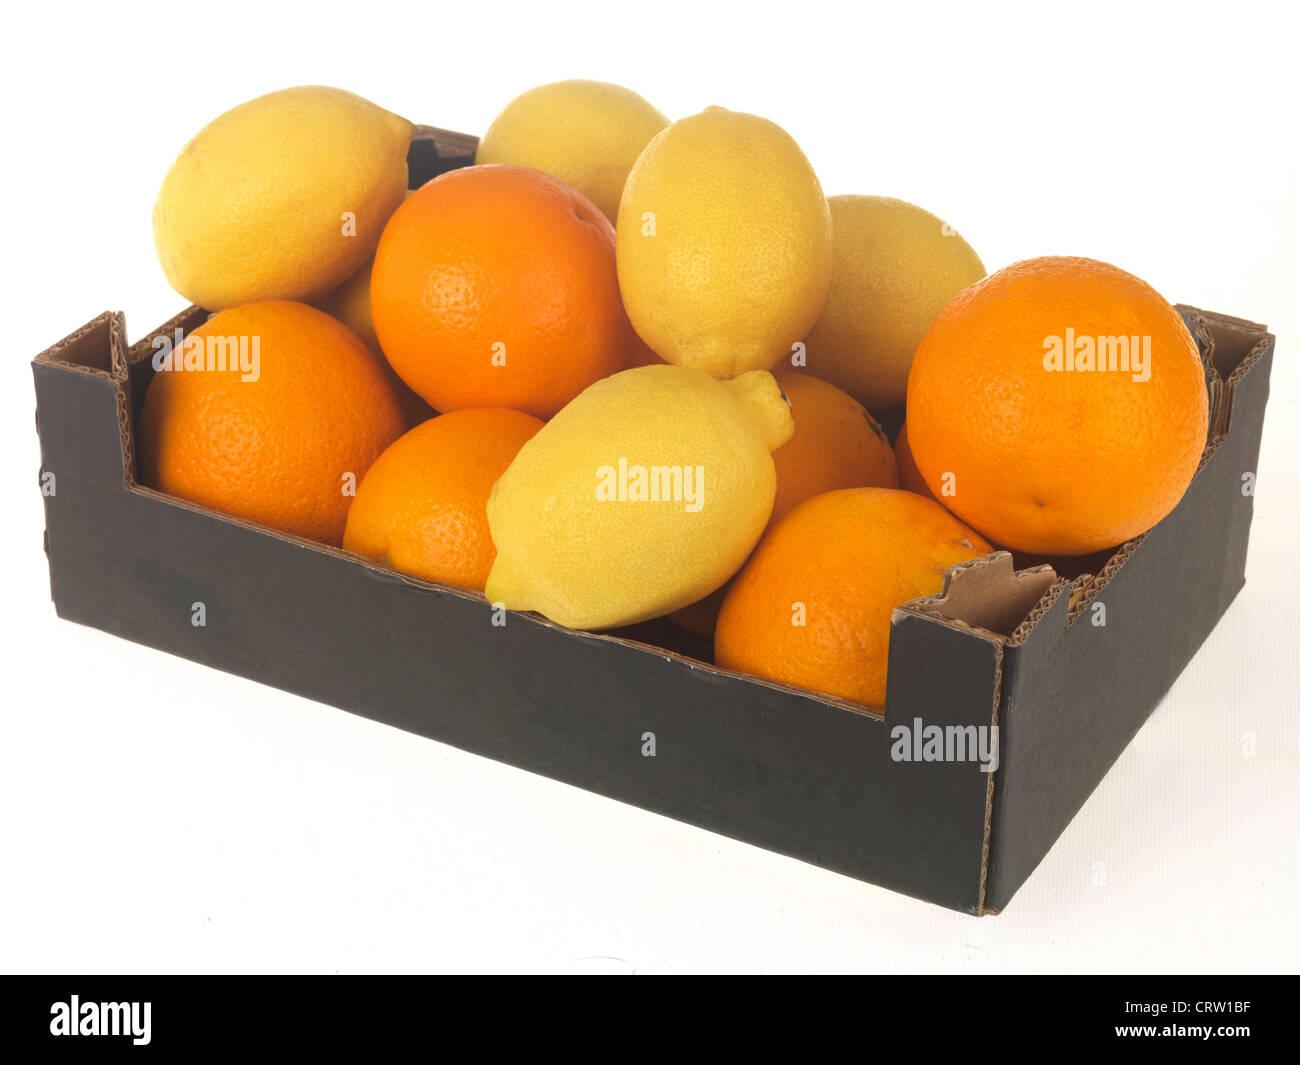 Oranges and Lemons - Stock Image